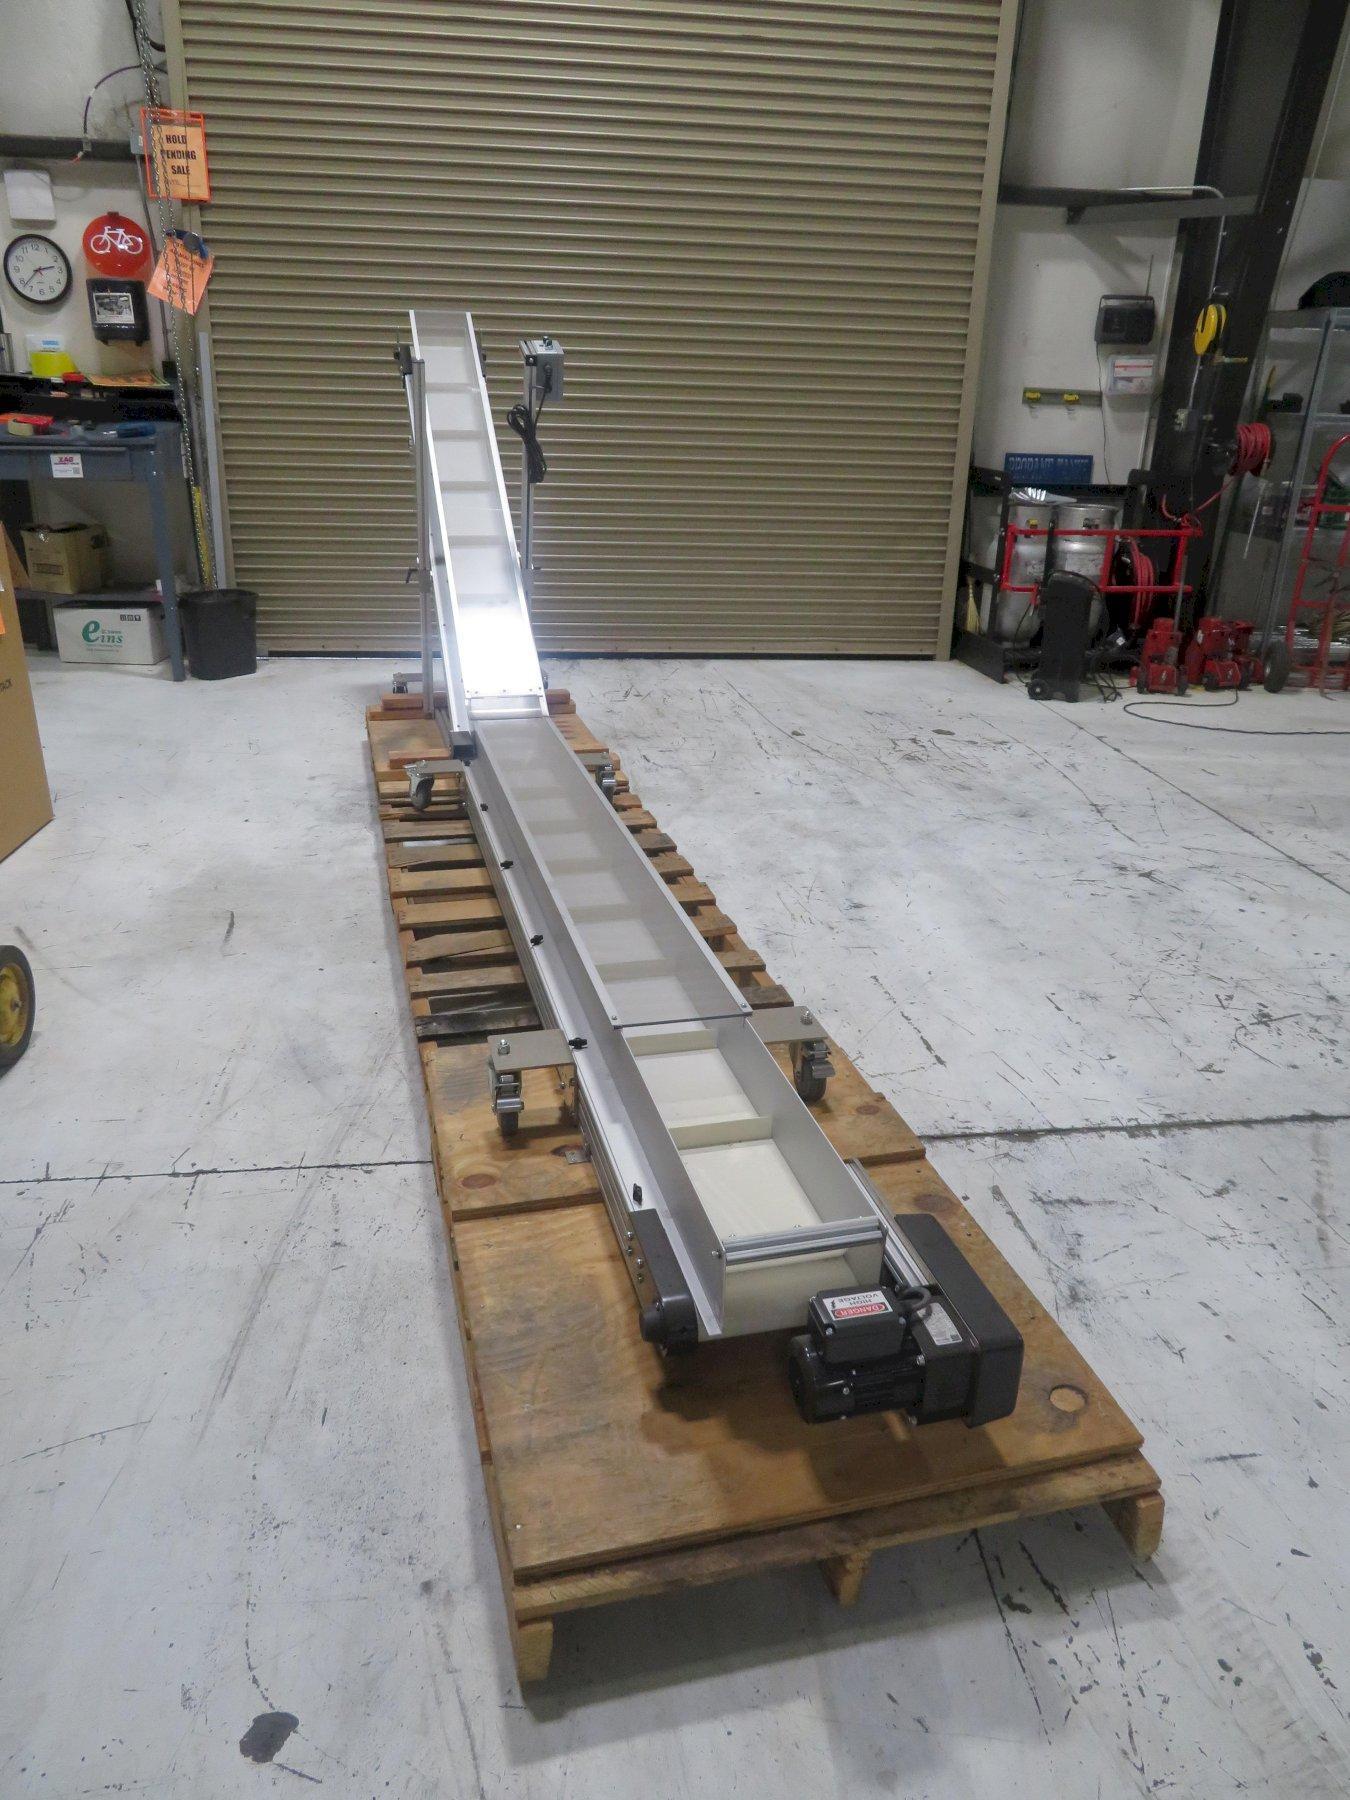 "HFA 2230 Horizontal to Incline Conveyor, 10"" wide x 8.5 ft horizontal x 7.25 ft incline, 110V"